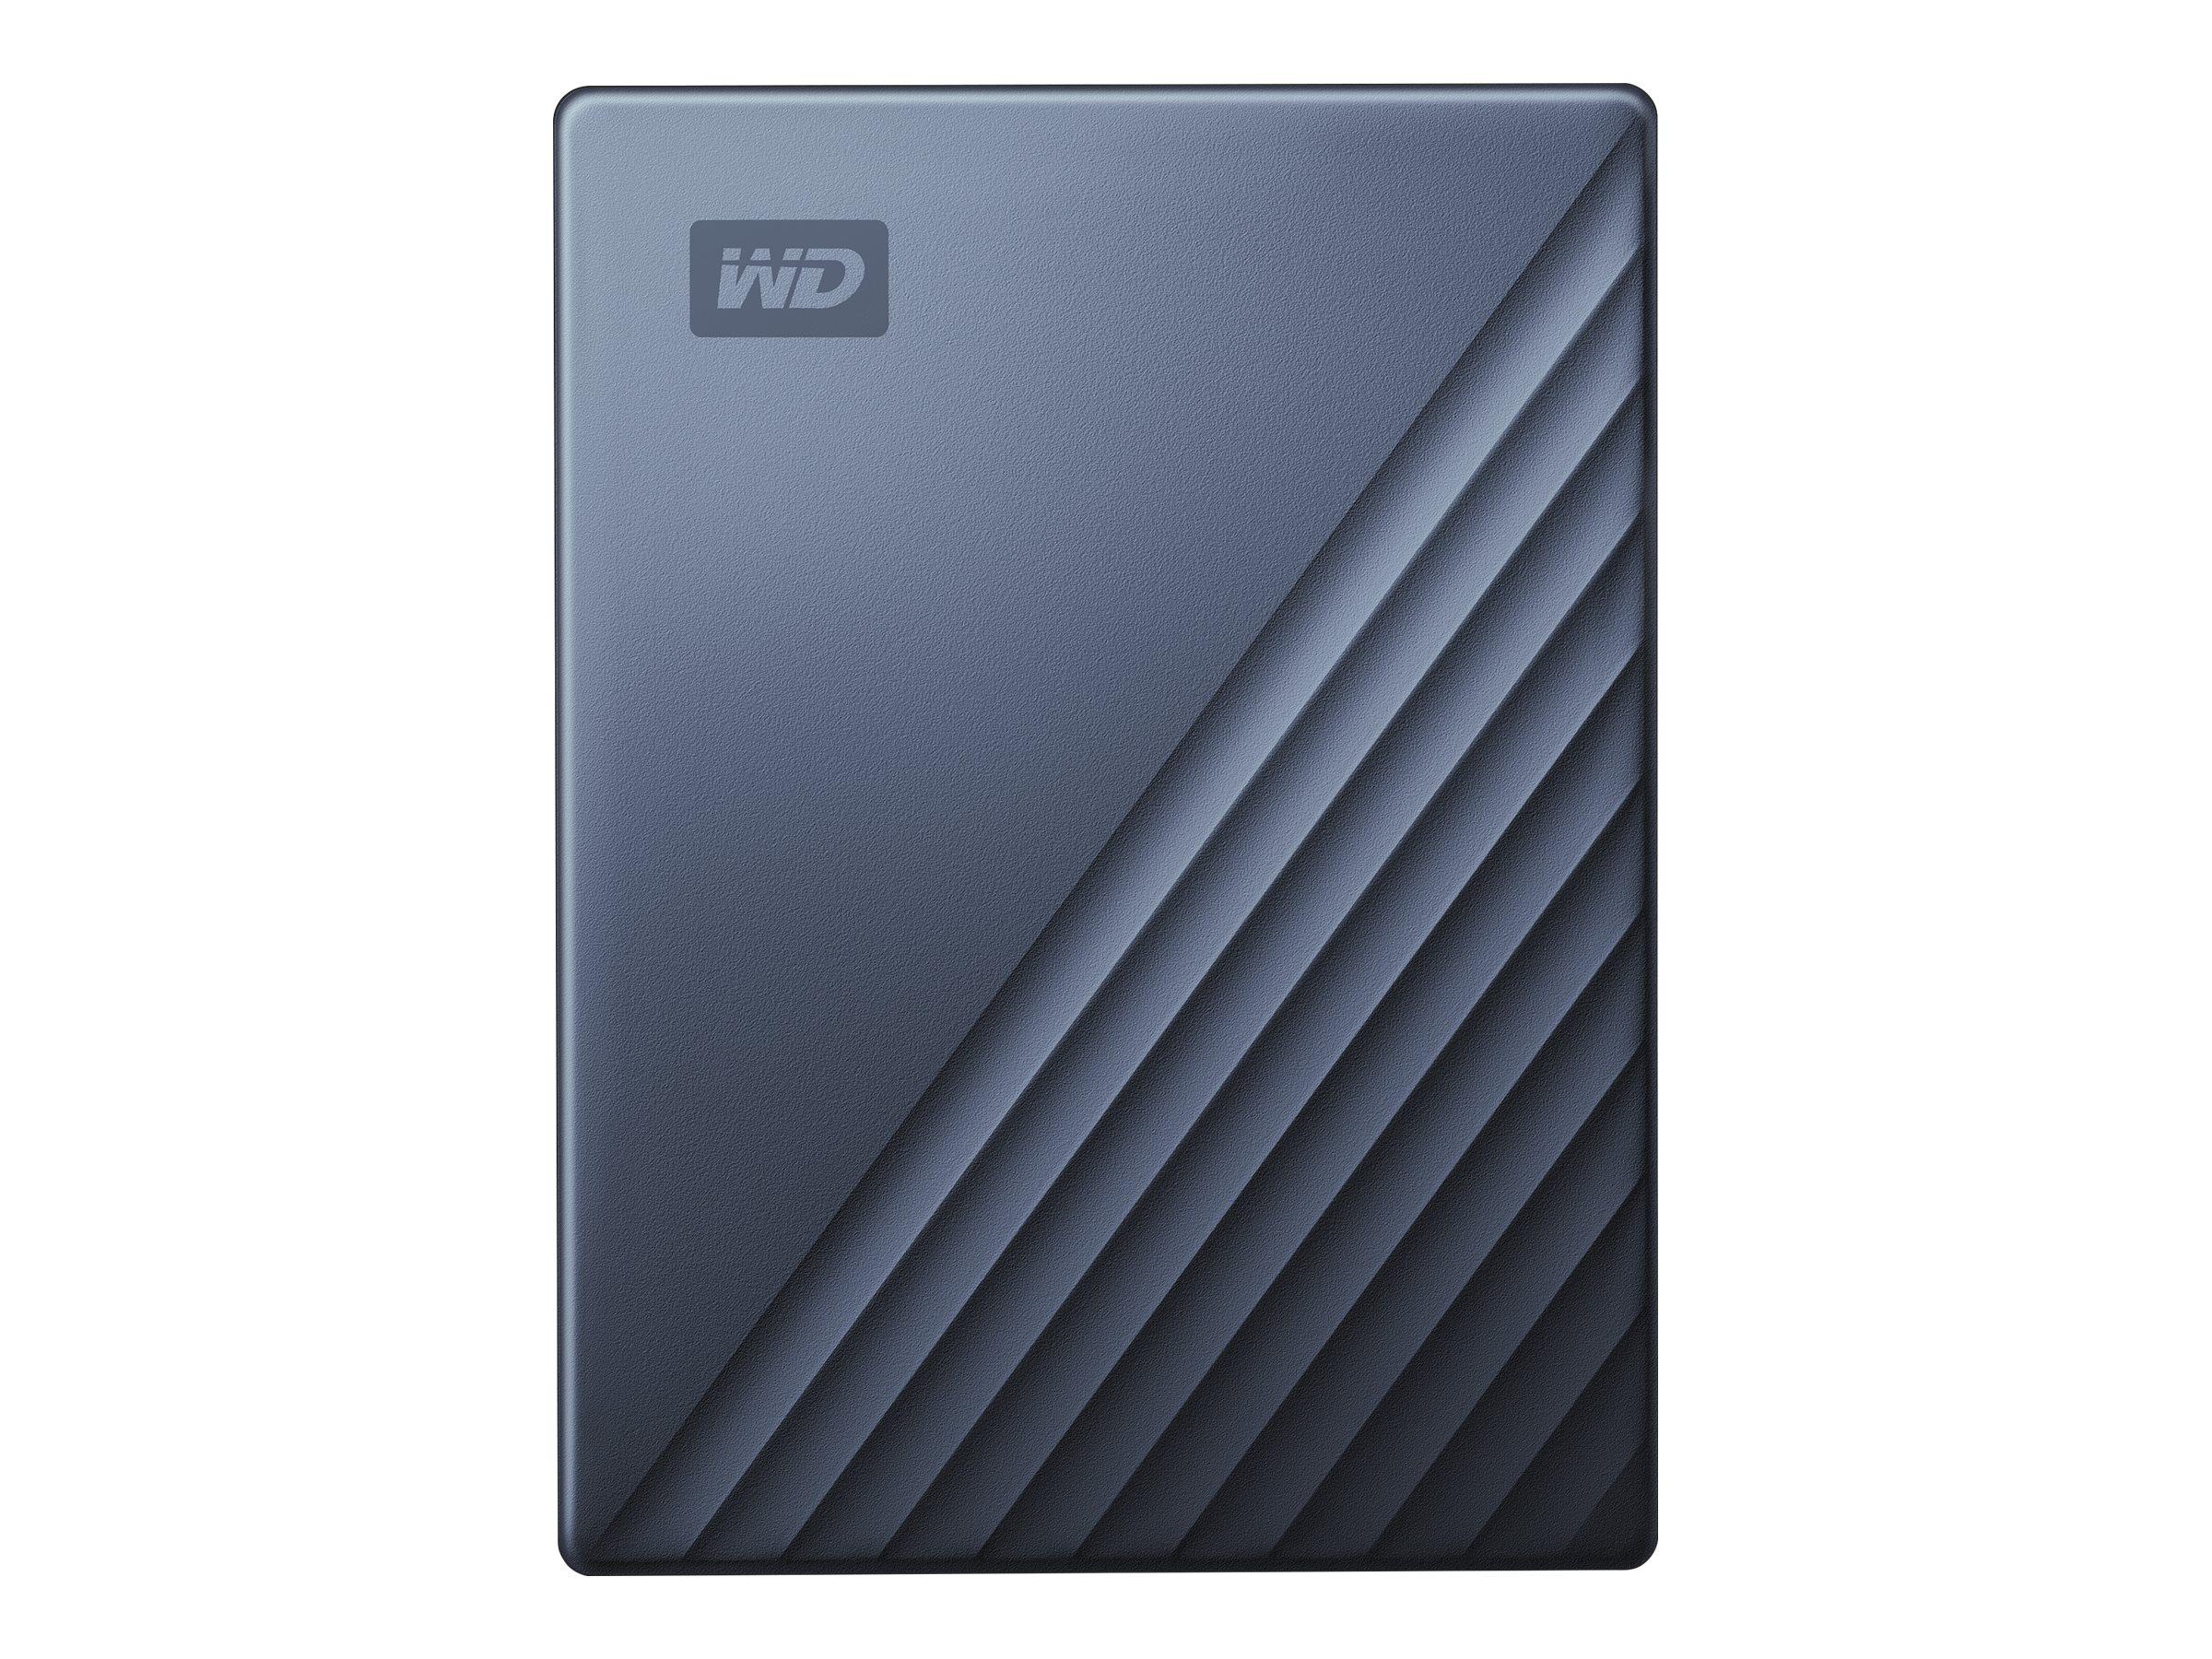 WD My Passport Ultra WDBC3C0020BBL - Festplatte - verschlüsselt - 2 TB - extern (tragbar) - USB 3.0 (USB-C Steckverbinder)